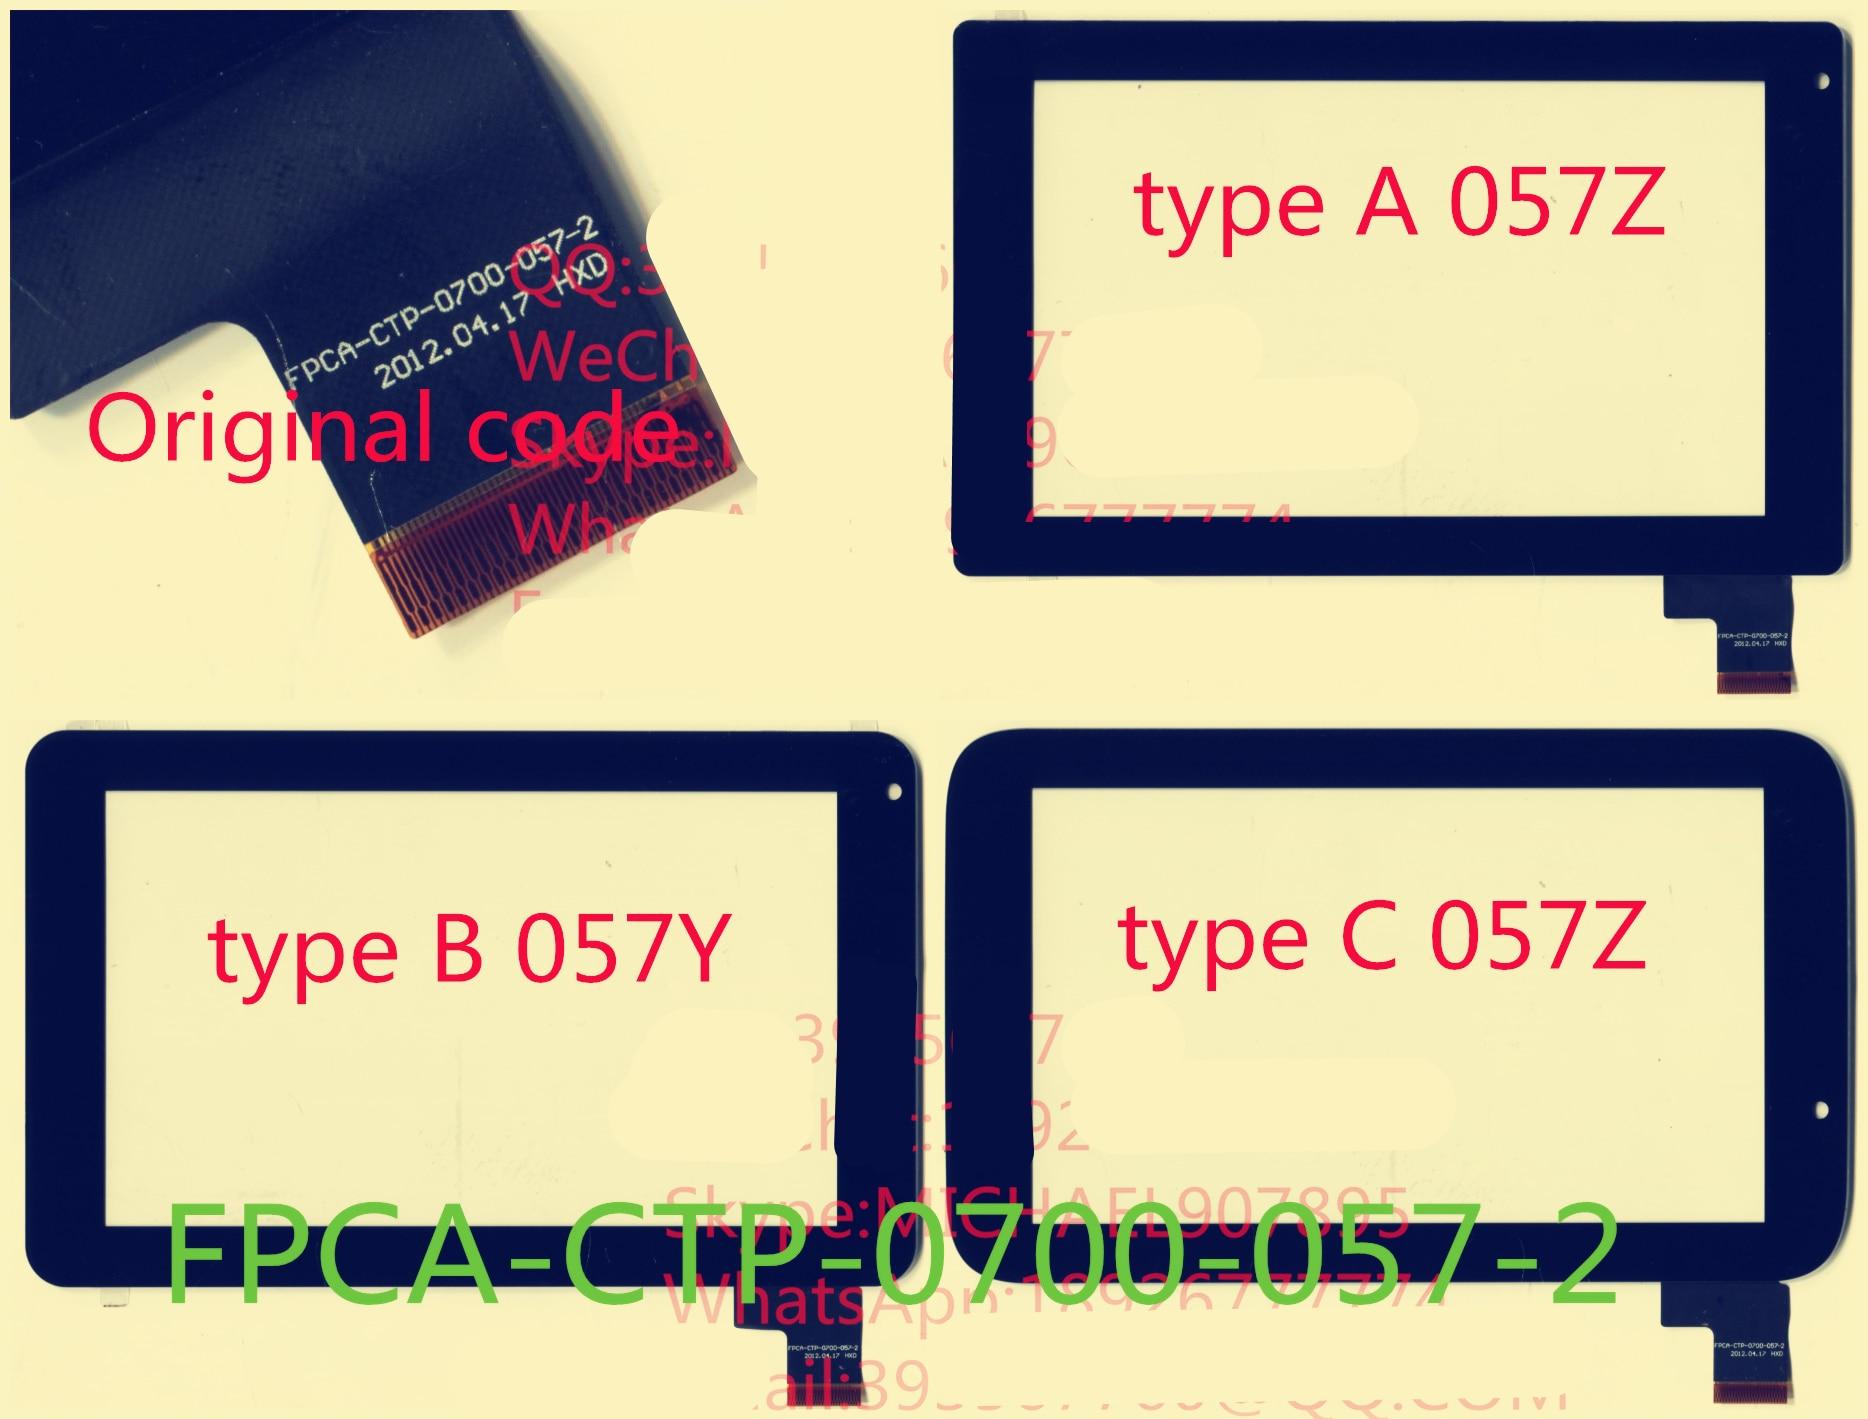 все цены на Black 7 Inch for 3Q Qoo! q-pad QS0730C tablet pc capacitive touch screen glass digitizer panel P/N FPCA-CTP-0700-057-2 онлайн